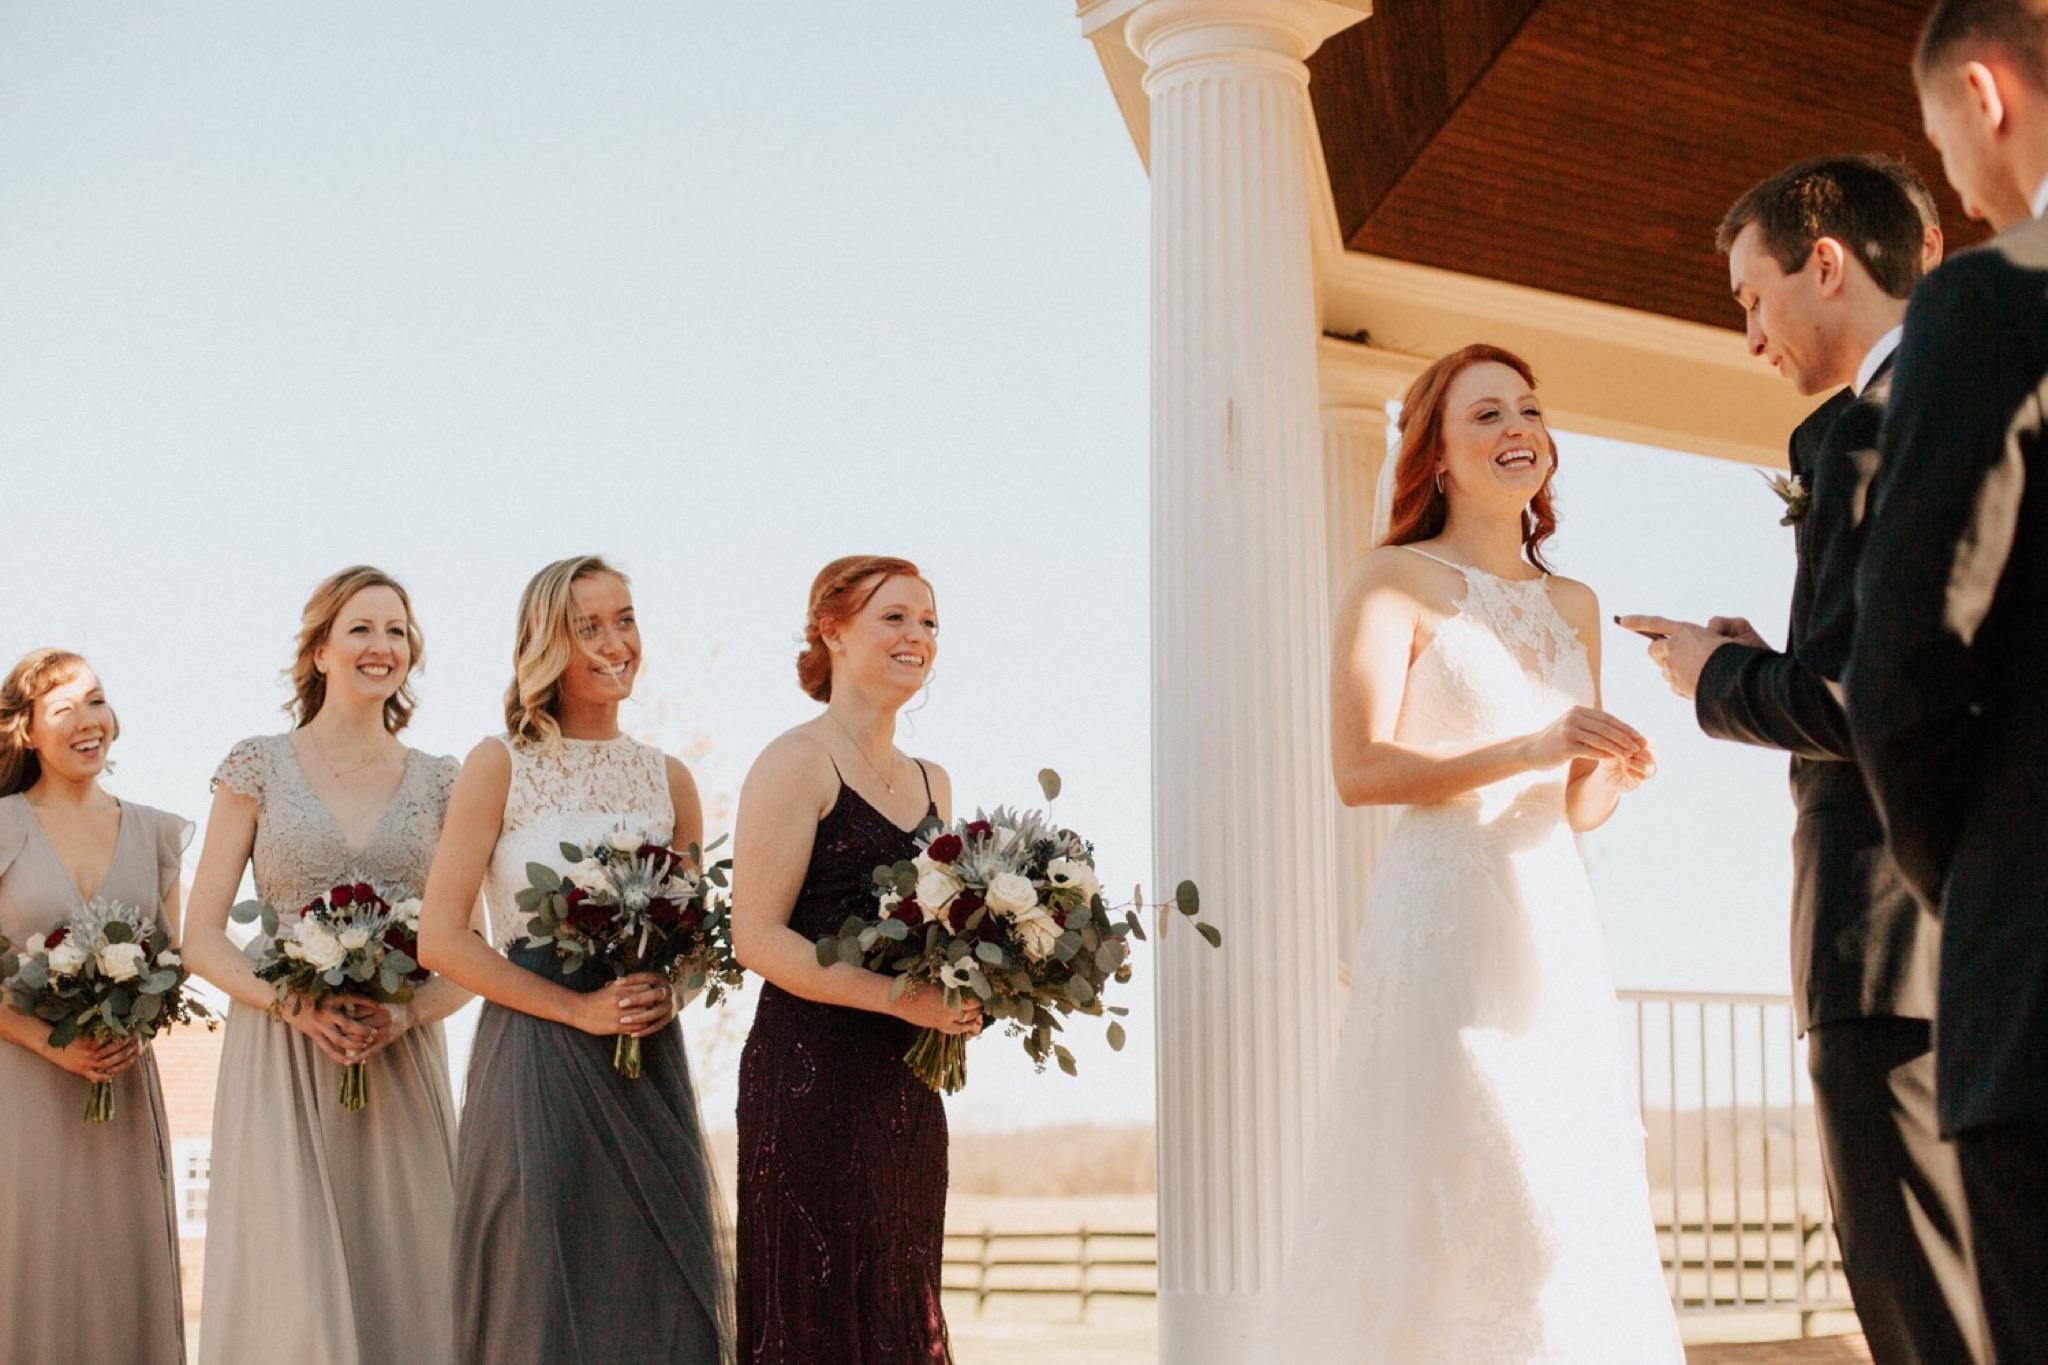 46_West Manor Estate Weddings - Pat Cori Photography-100_Ceremony_VirginiaWeddingPhotographer_PatCoriPhotography_WestManorEstate_Wedding.jpg